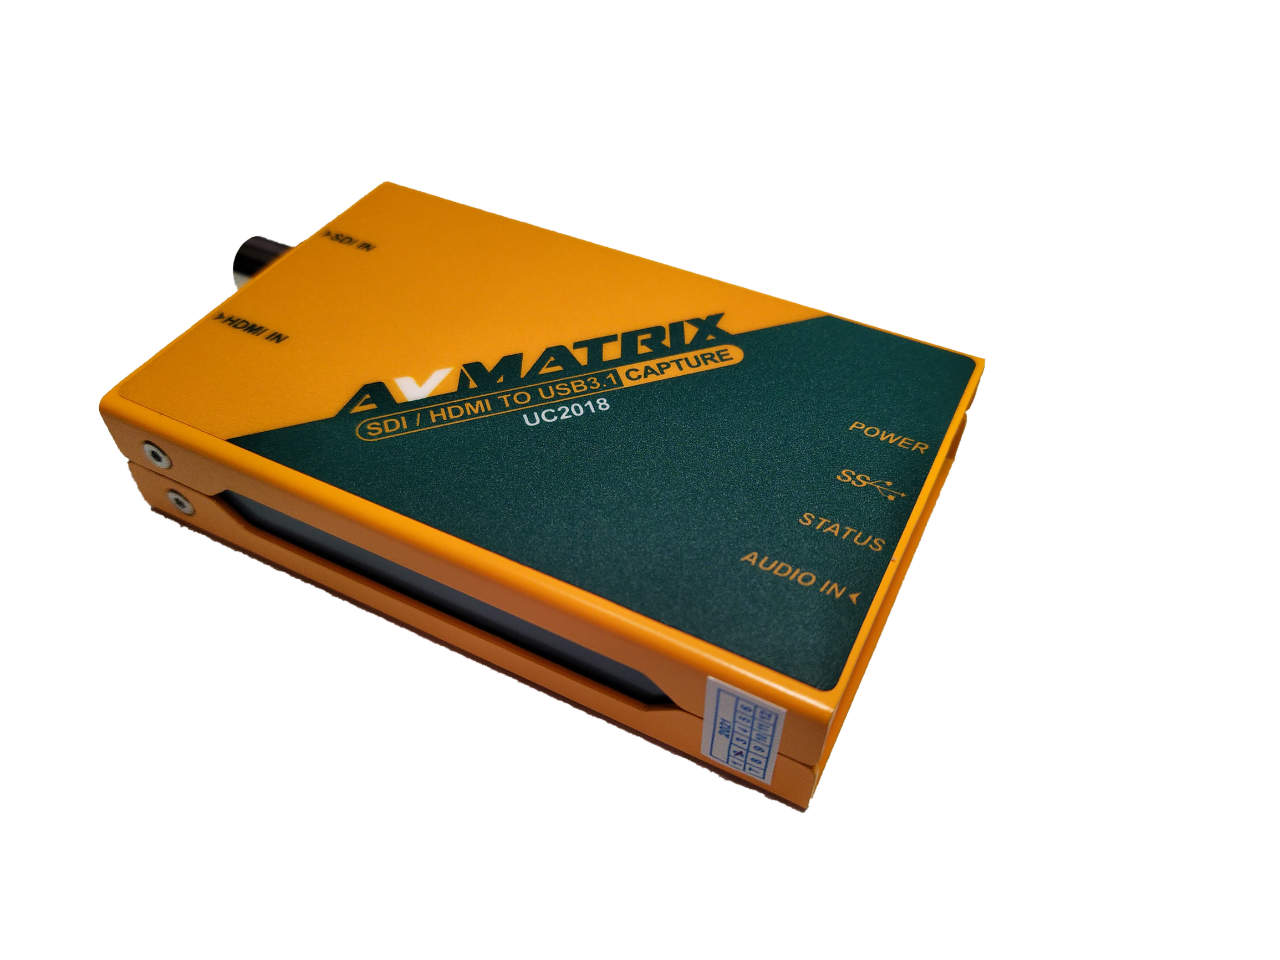 Artikelfoto AVMATRIX UC2018 SDI HDMi Capture zu USB 3.0